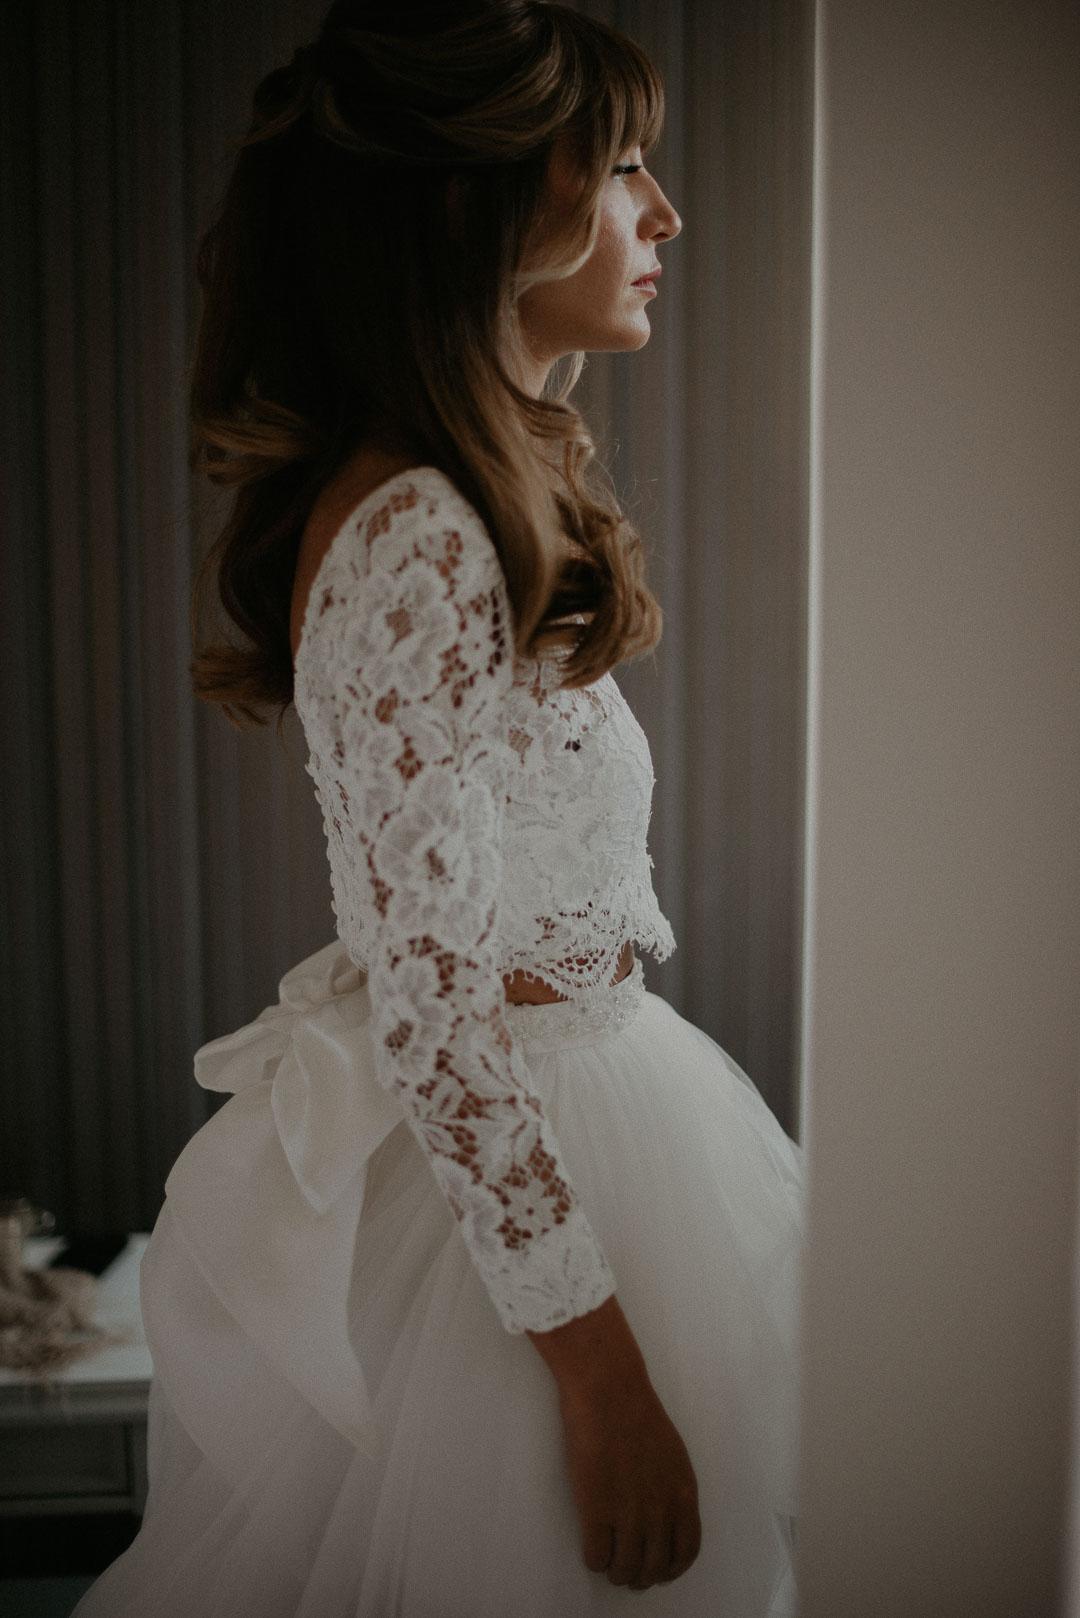 wedding-photographer-destination-fineart-bespoke-reportage-napoli-nabilah-vivianeizzo-spazio46-49